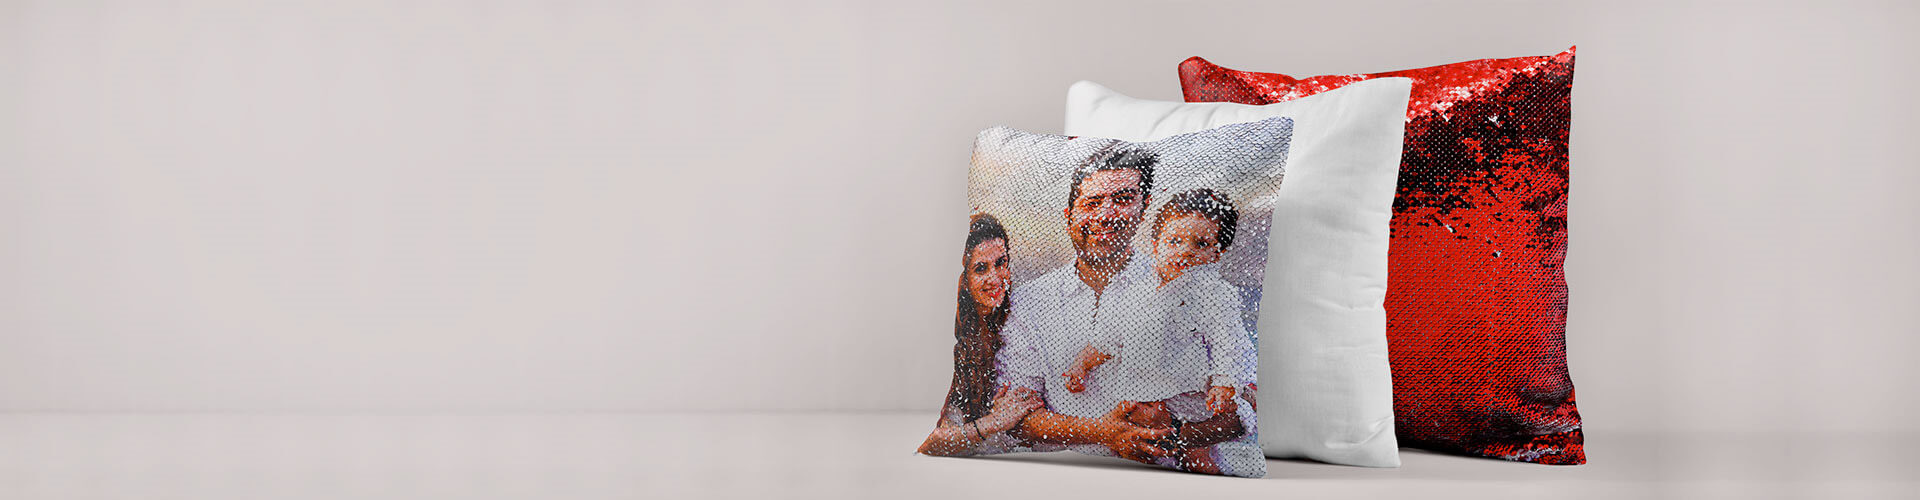 Custom Sequin Photo Pillows